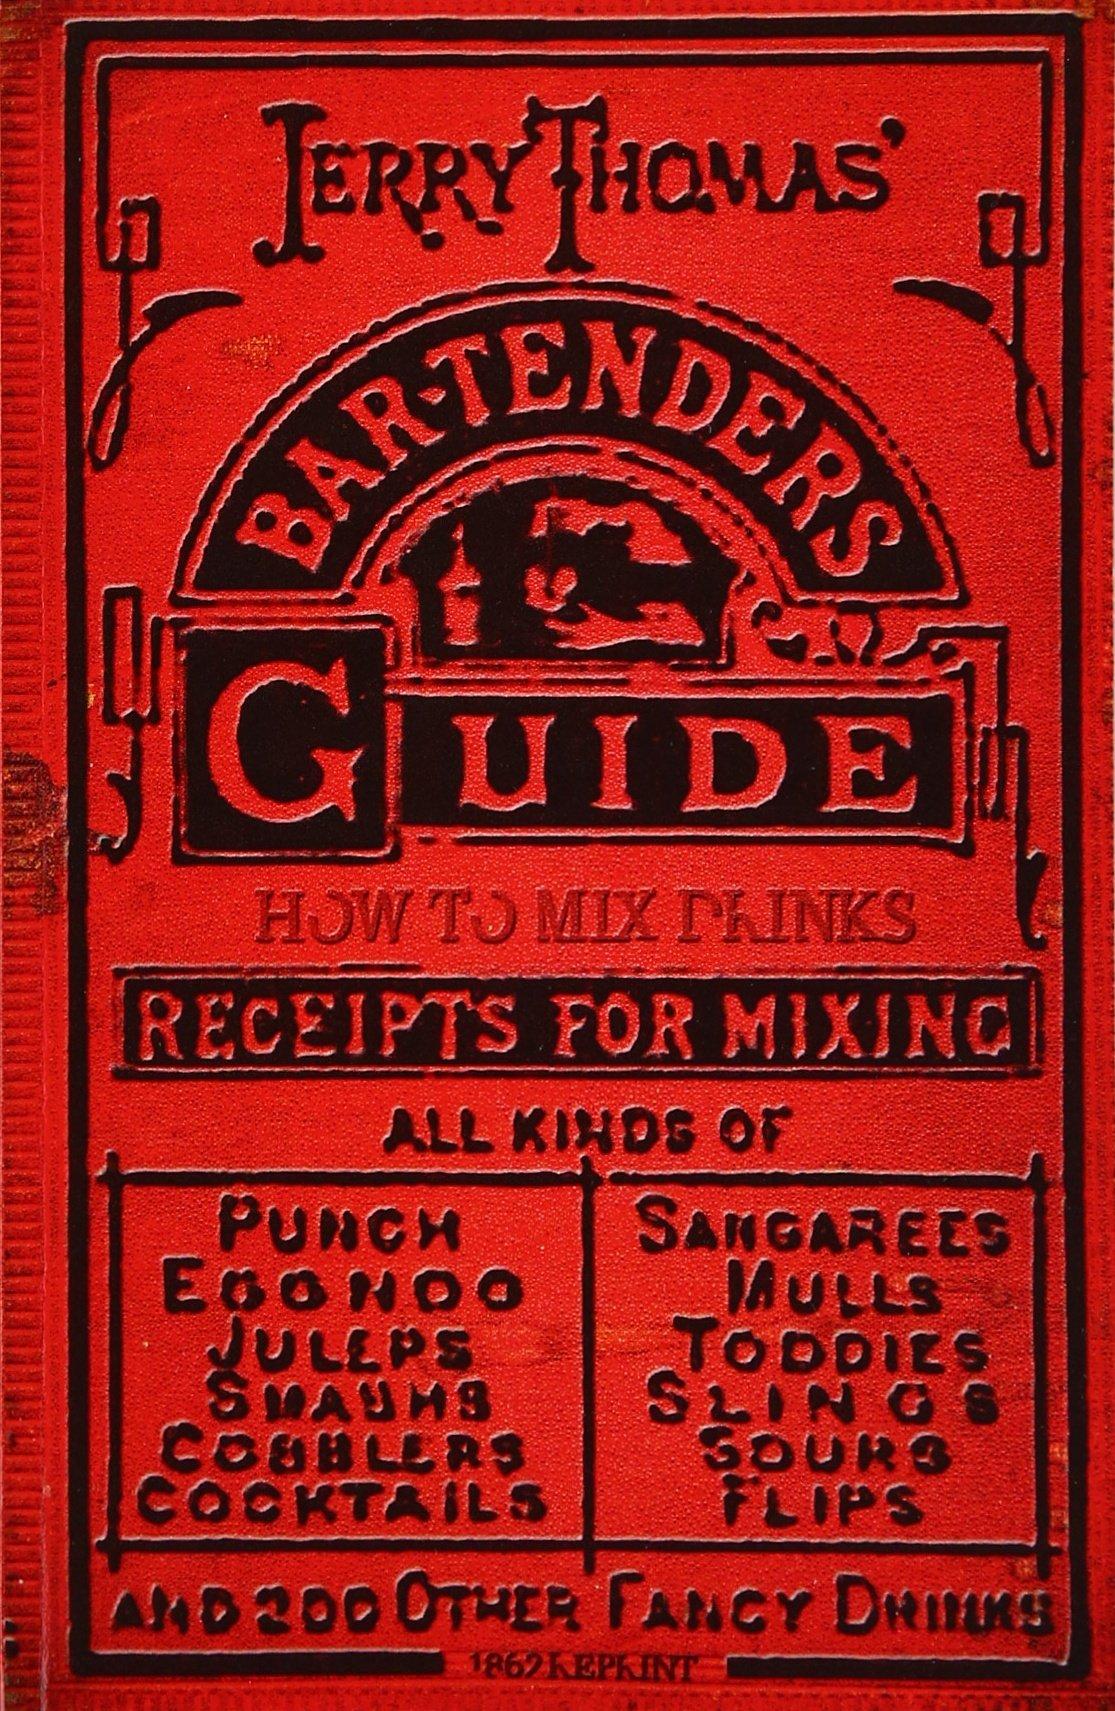 Jerry Thomas' Bartenders Guide: How To Mix Drinks 1862 Reprint: A Bon Vivant's Companion